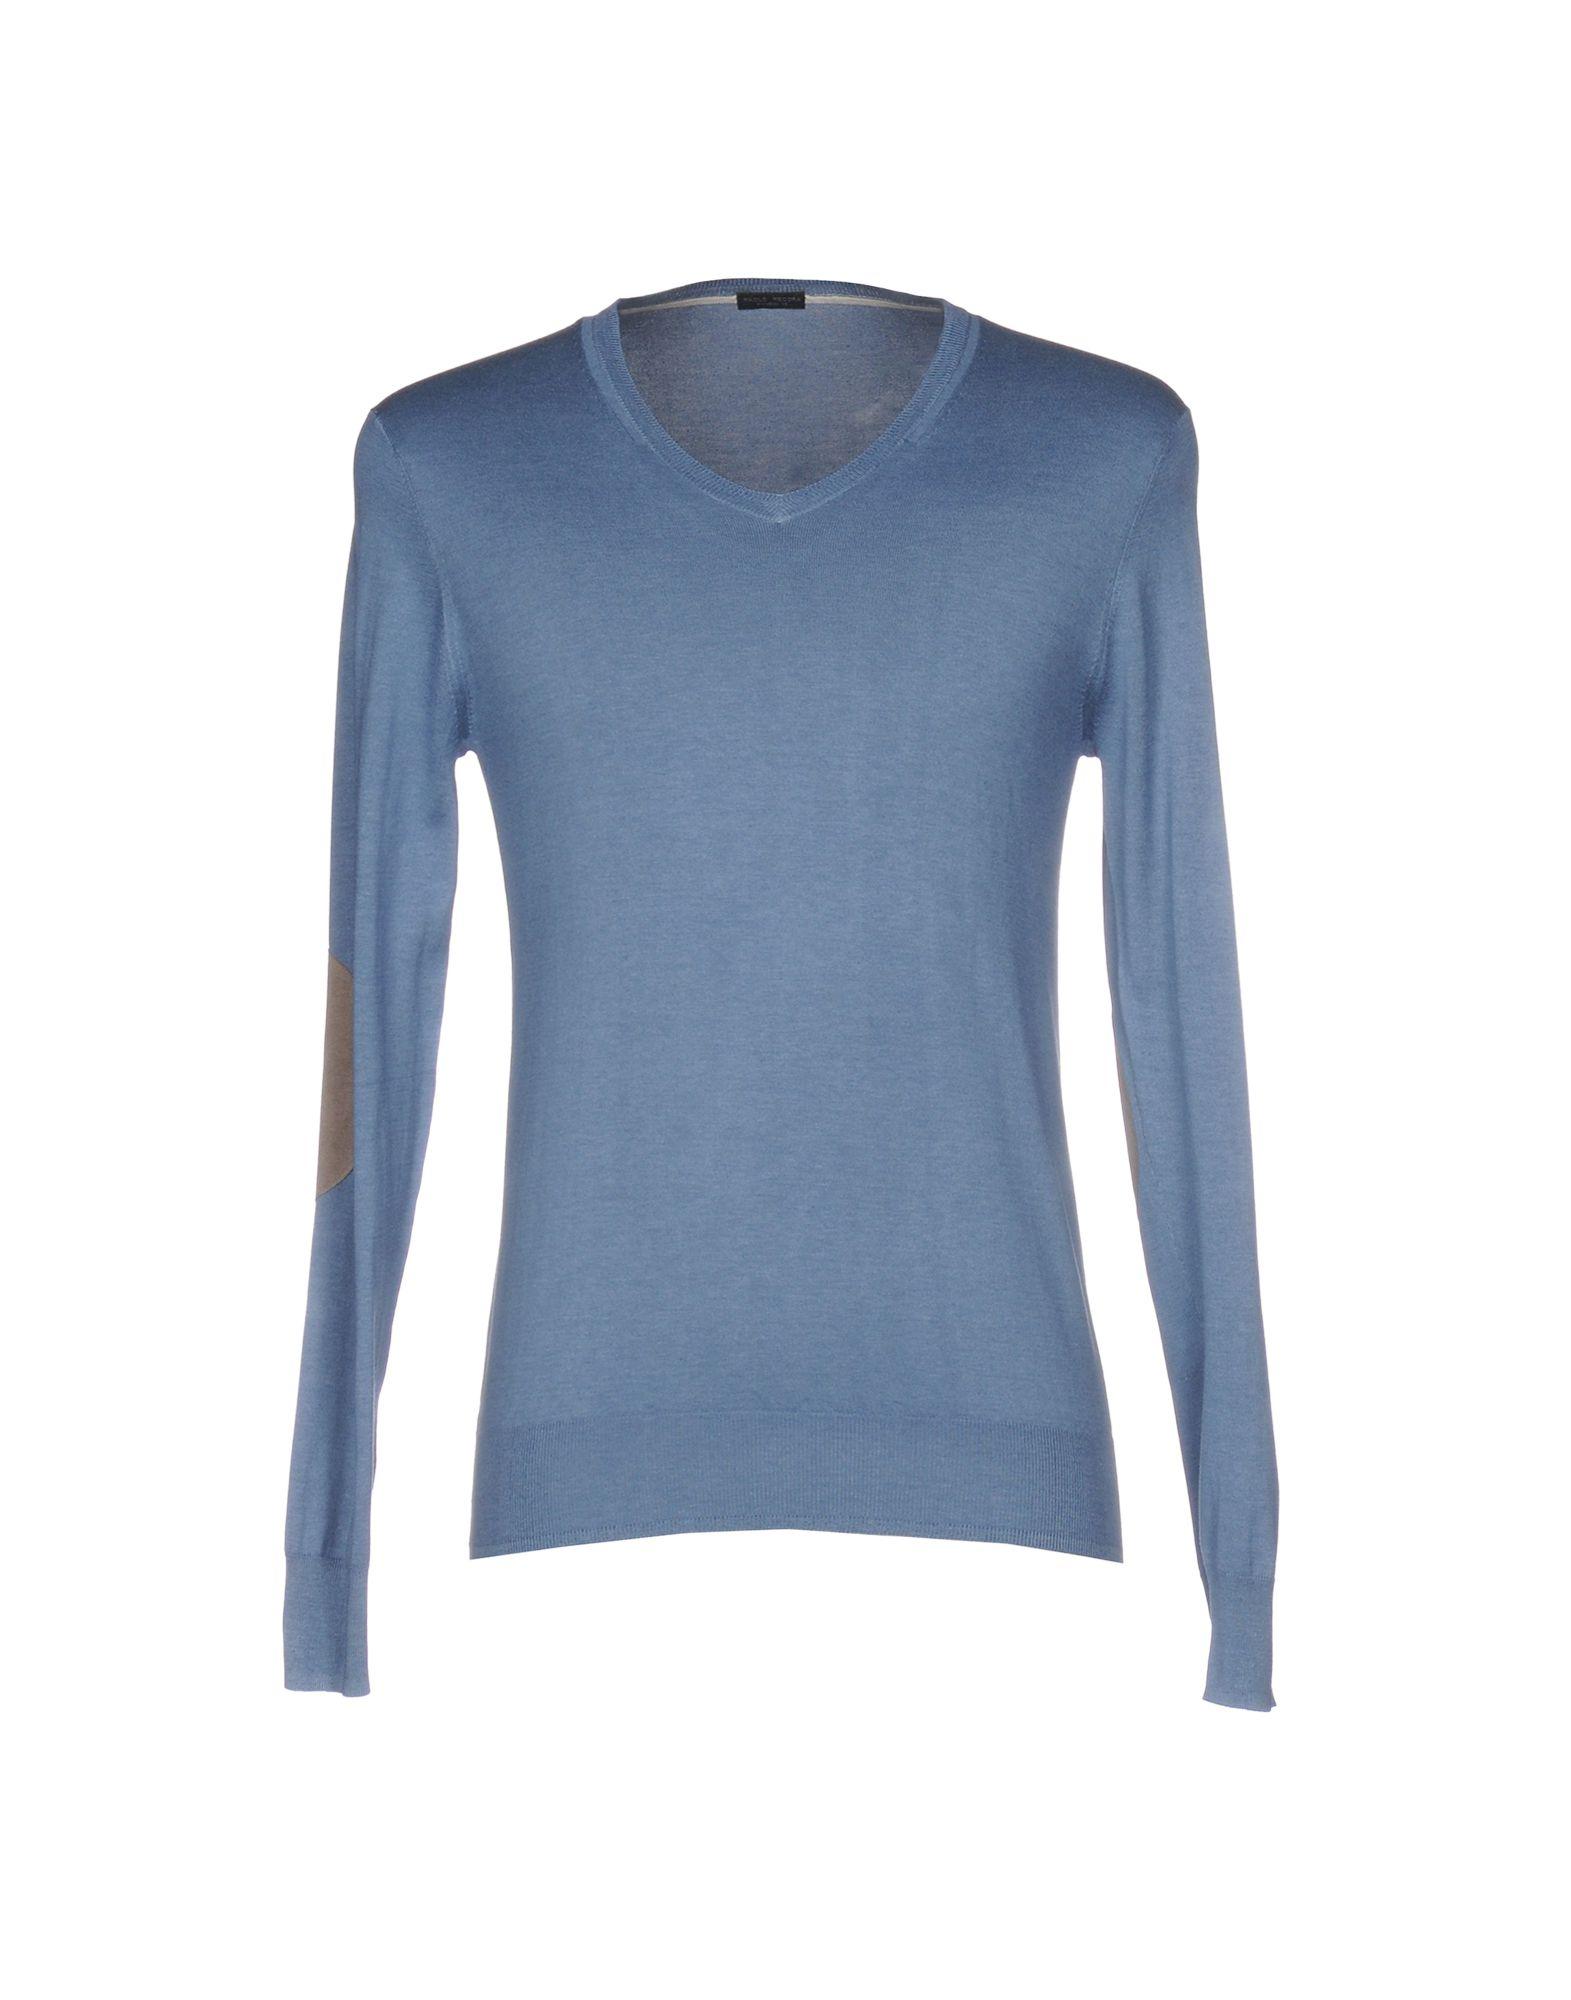 PAOLO PECORA Sweaters - Item 39702930